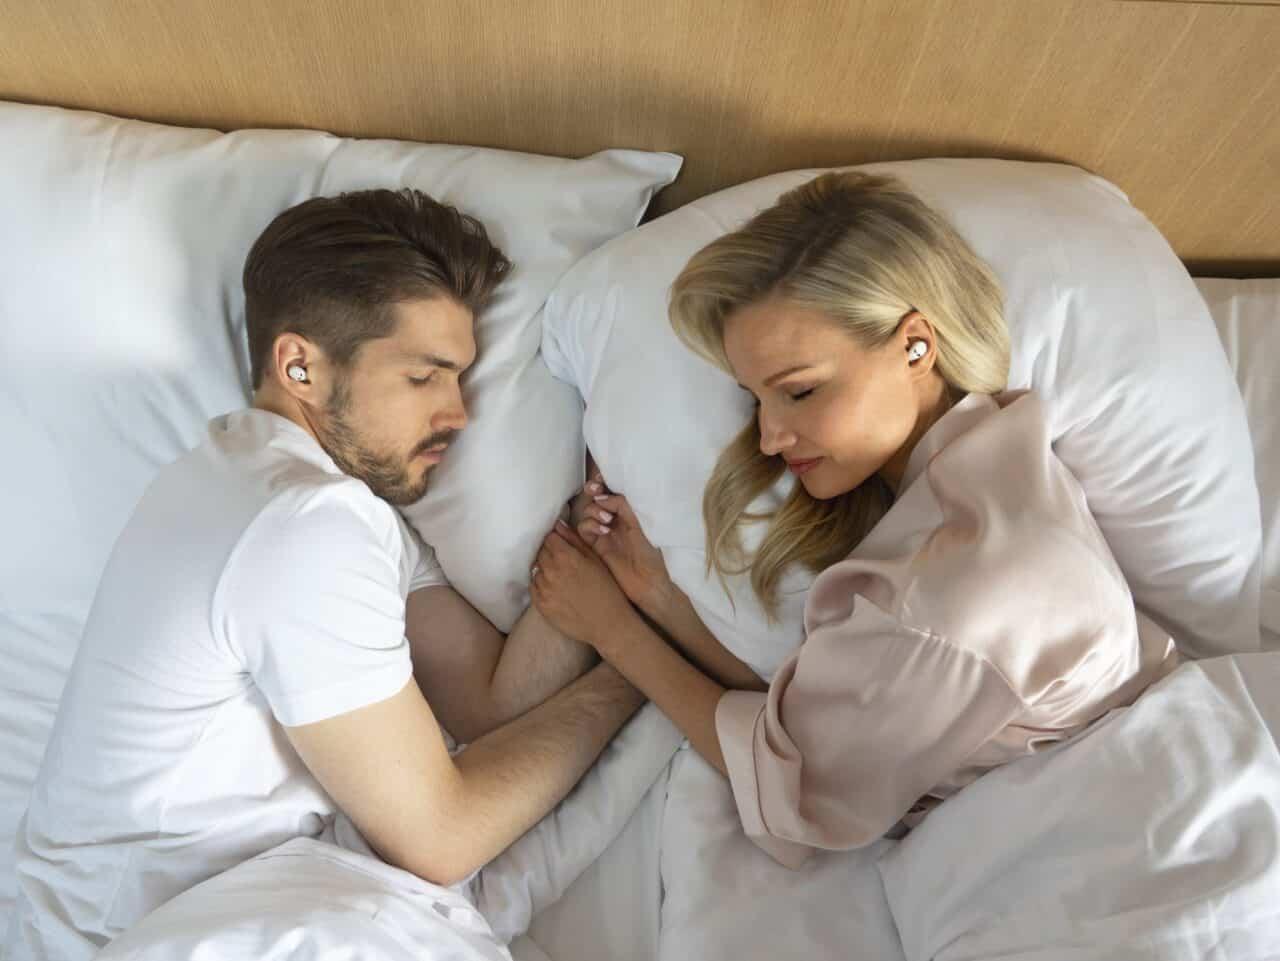 QuietOn - Parenting sleeping